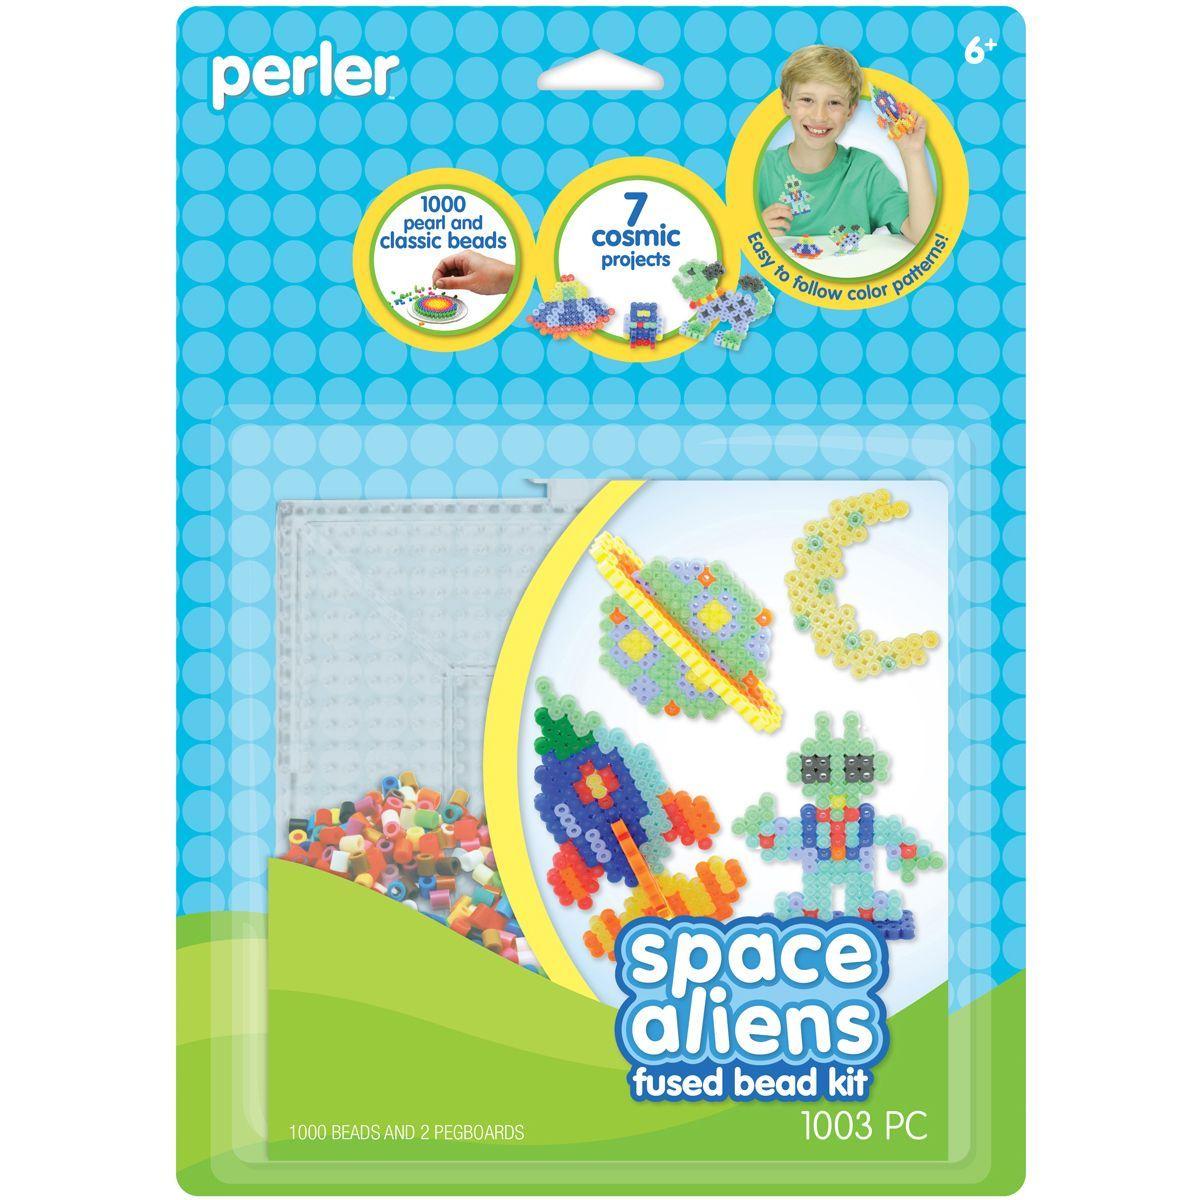 Perler Fun Fusion Fuse Bead Activity KitSpace Aliens